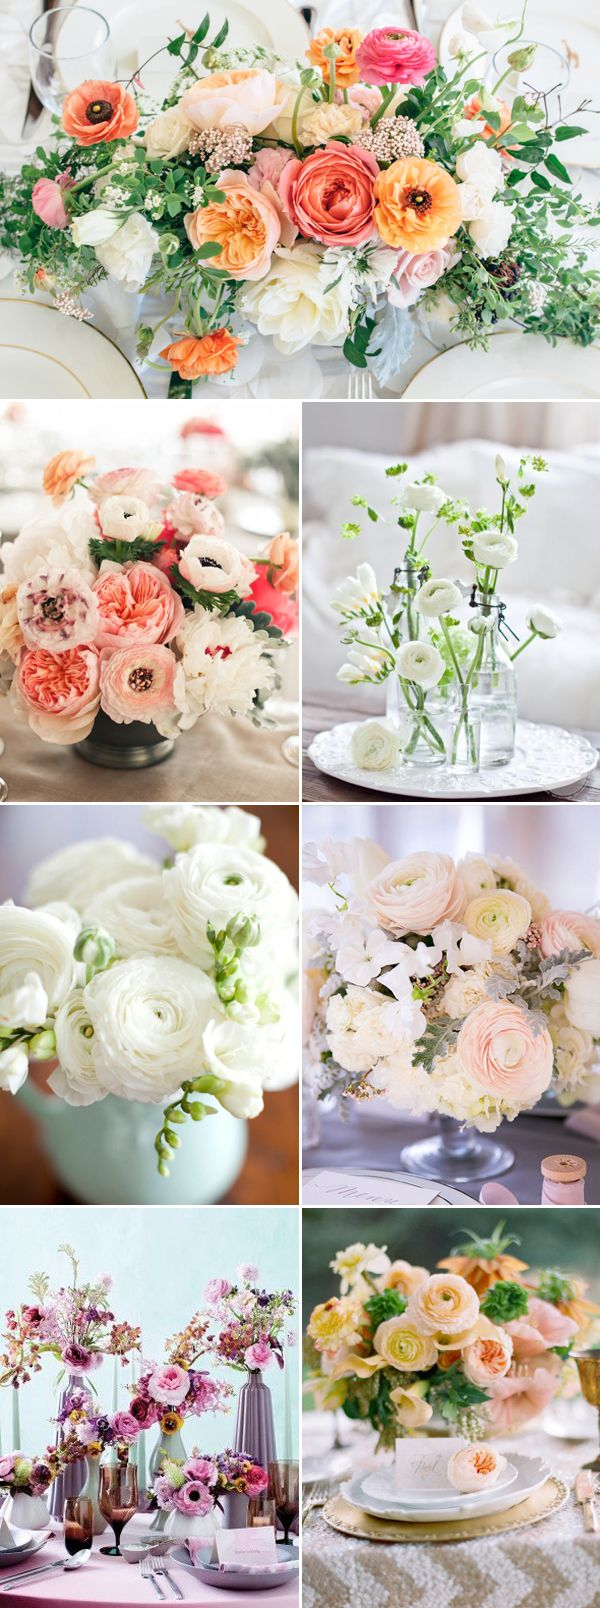 Best 10 ranunculus centerpiece ideas on pinterest cheap flower 30 beautiful wedding ideas that use ranunculus dhlflorist Image collections